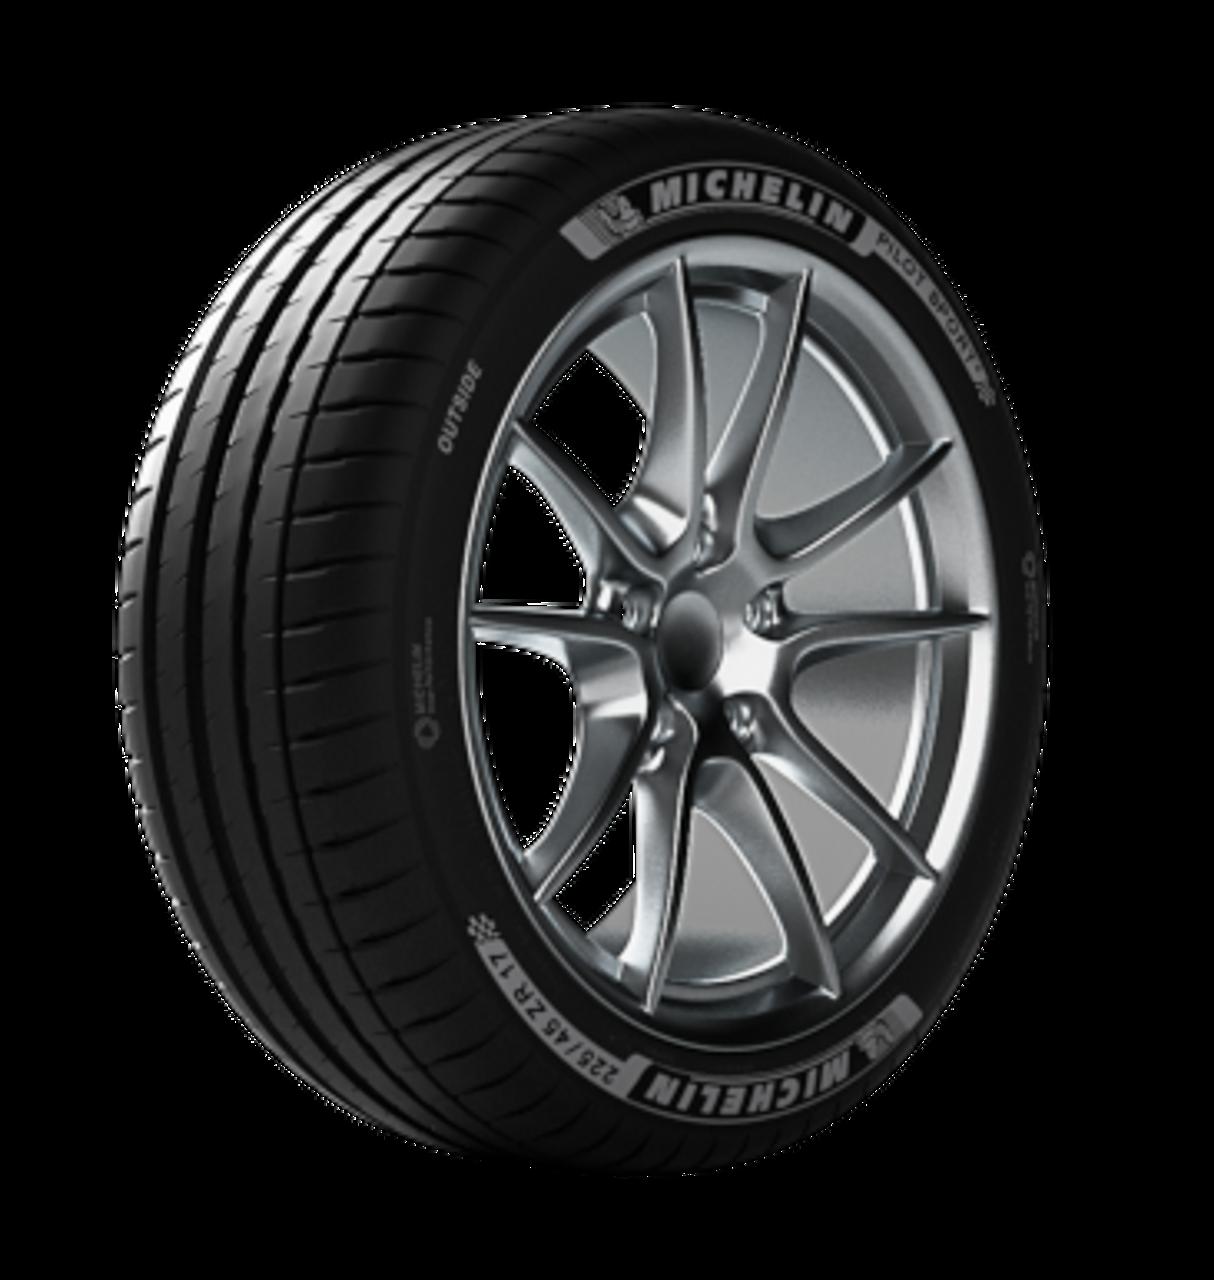 michelin pilot sport 4 tyres. Black Bedroom Furniture Sets. Home Design Ideas